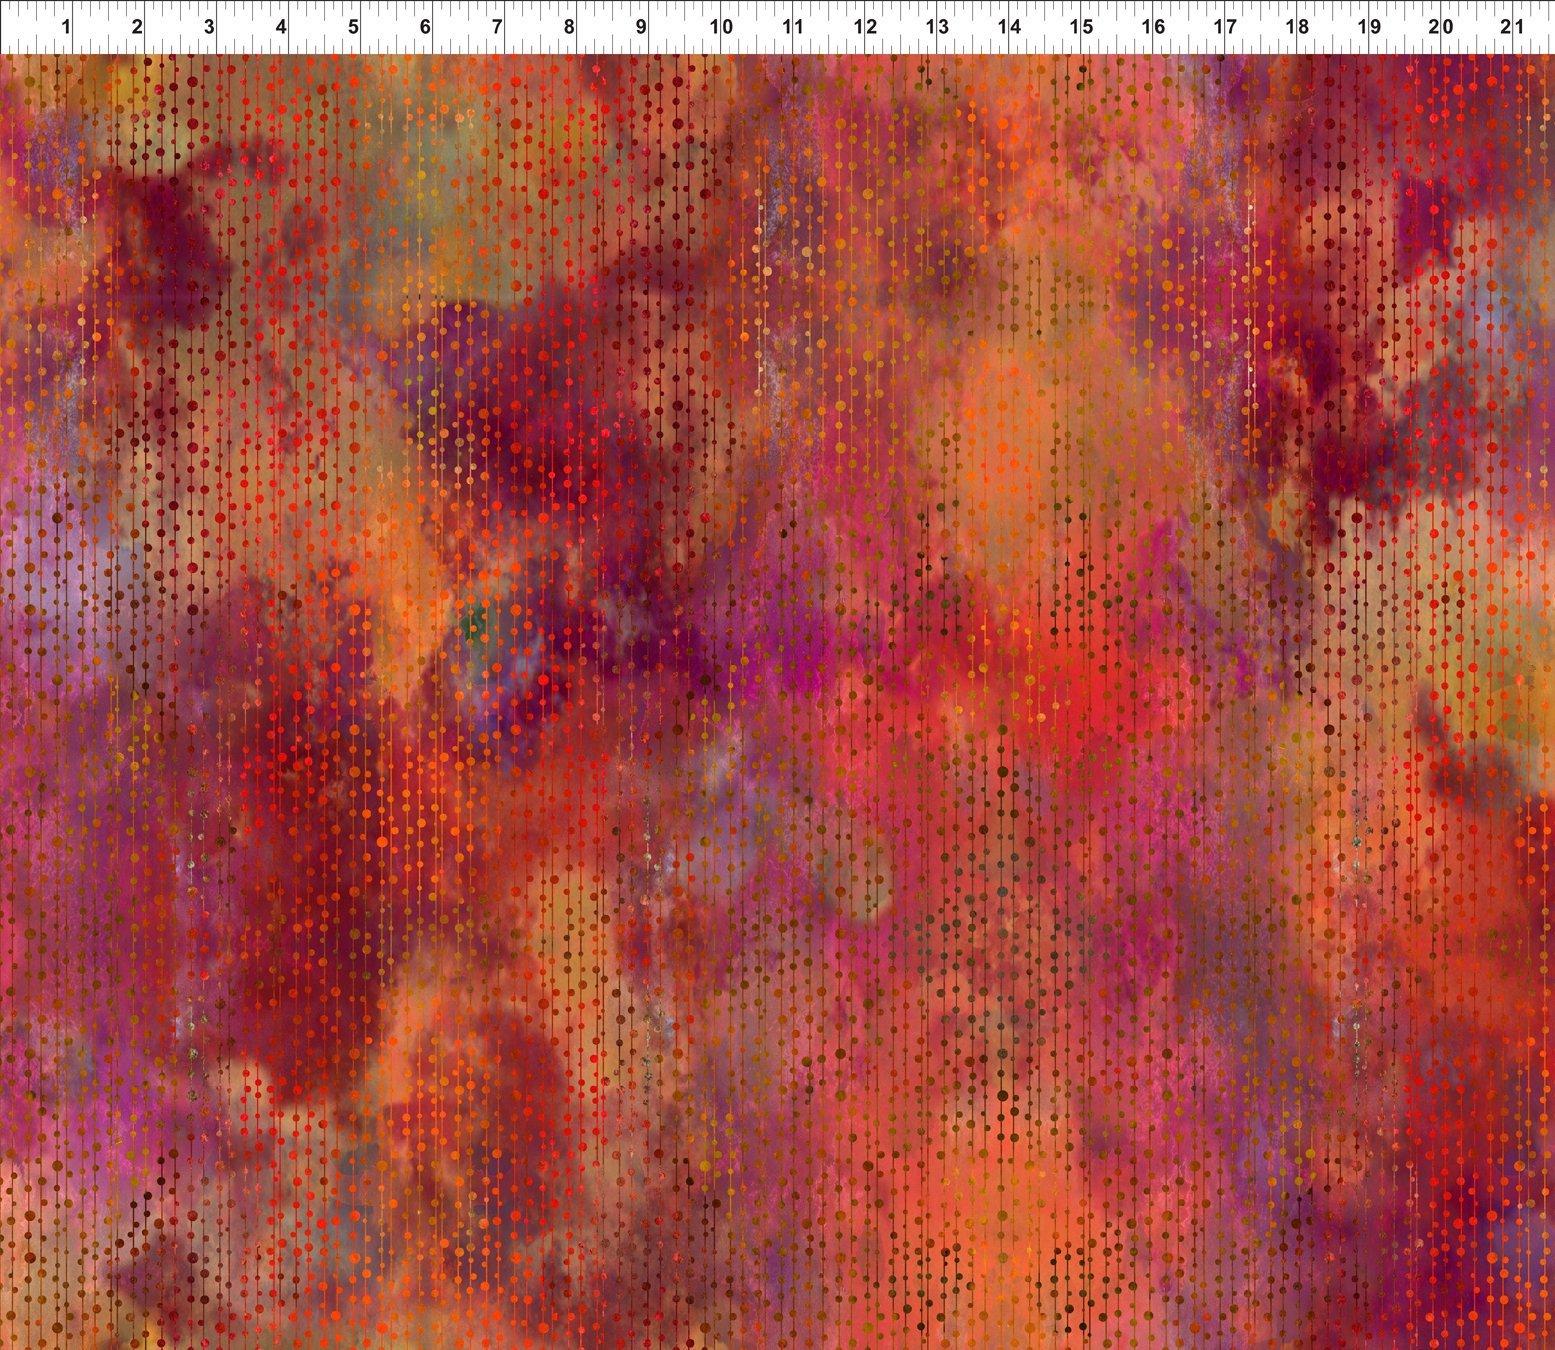 Garden of Dreams-Beads Red Glow 6JYL 1